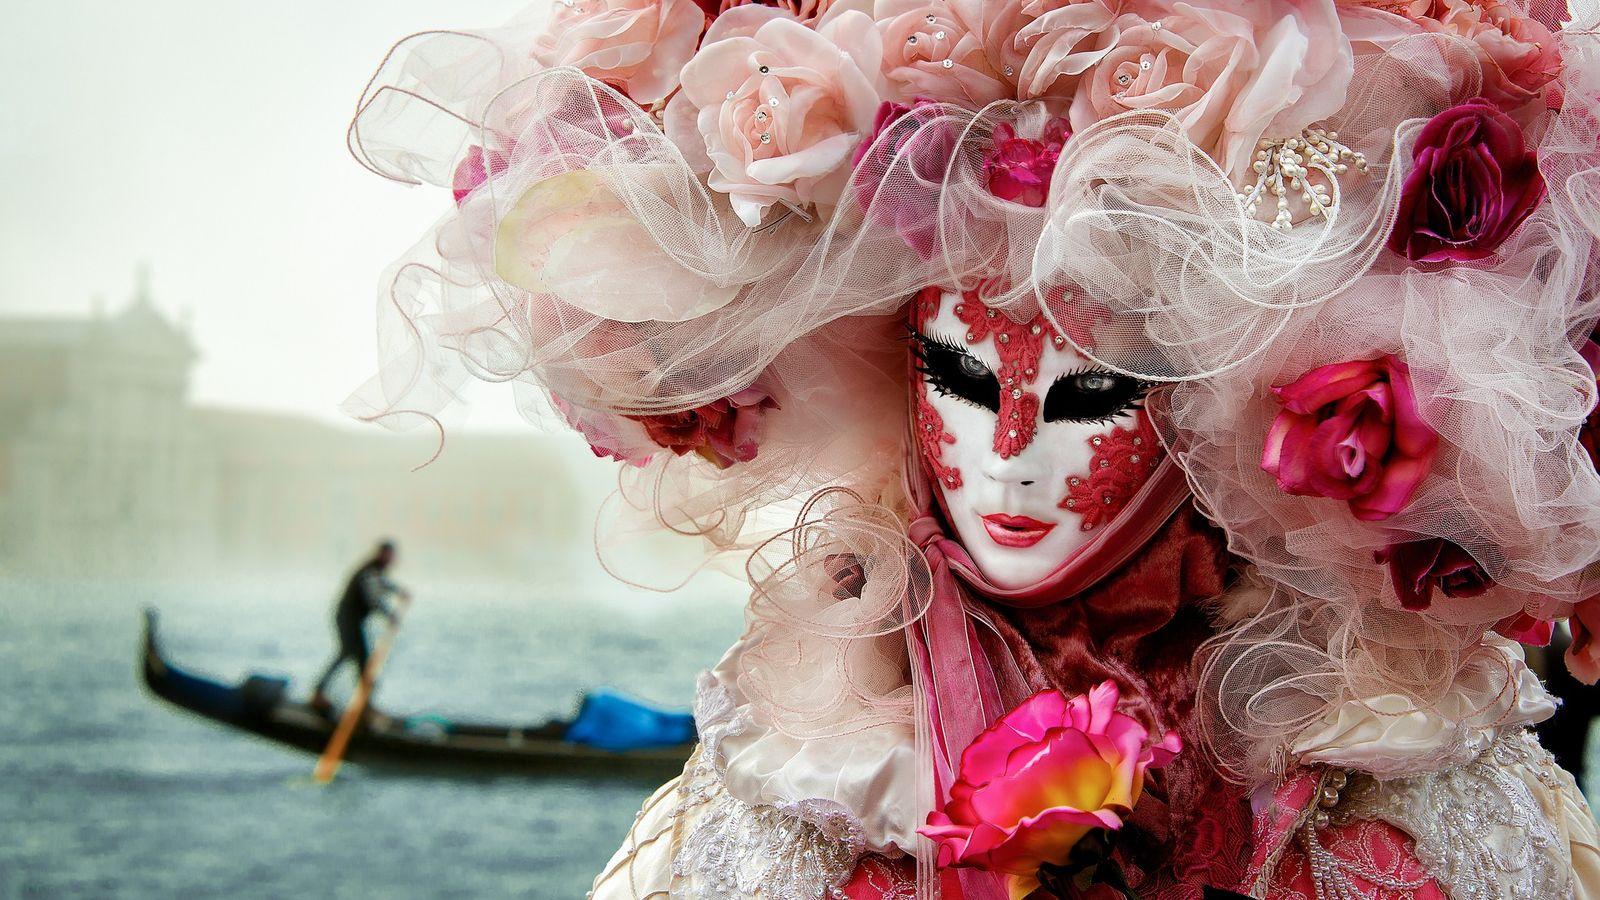 Masque de carnaval, princesse de Rose, carnaval de Venise.